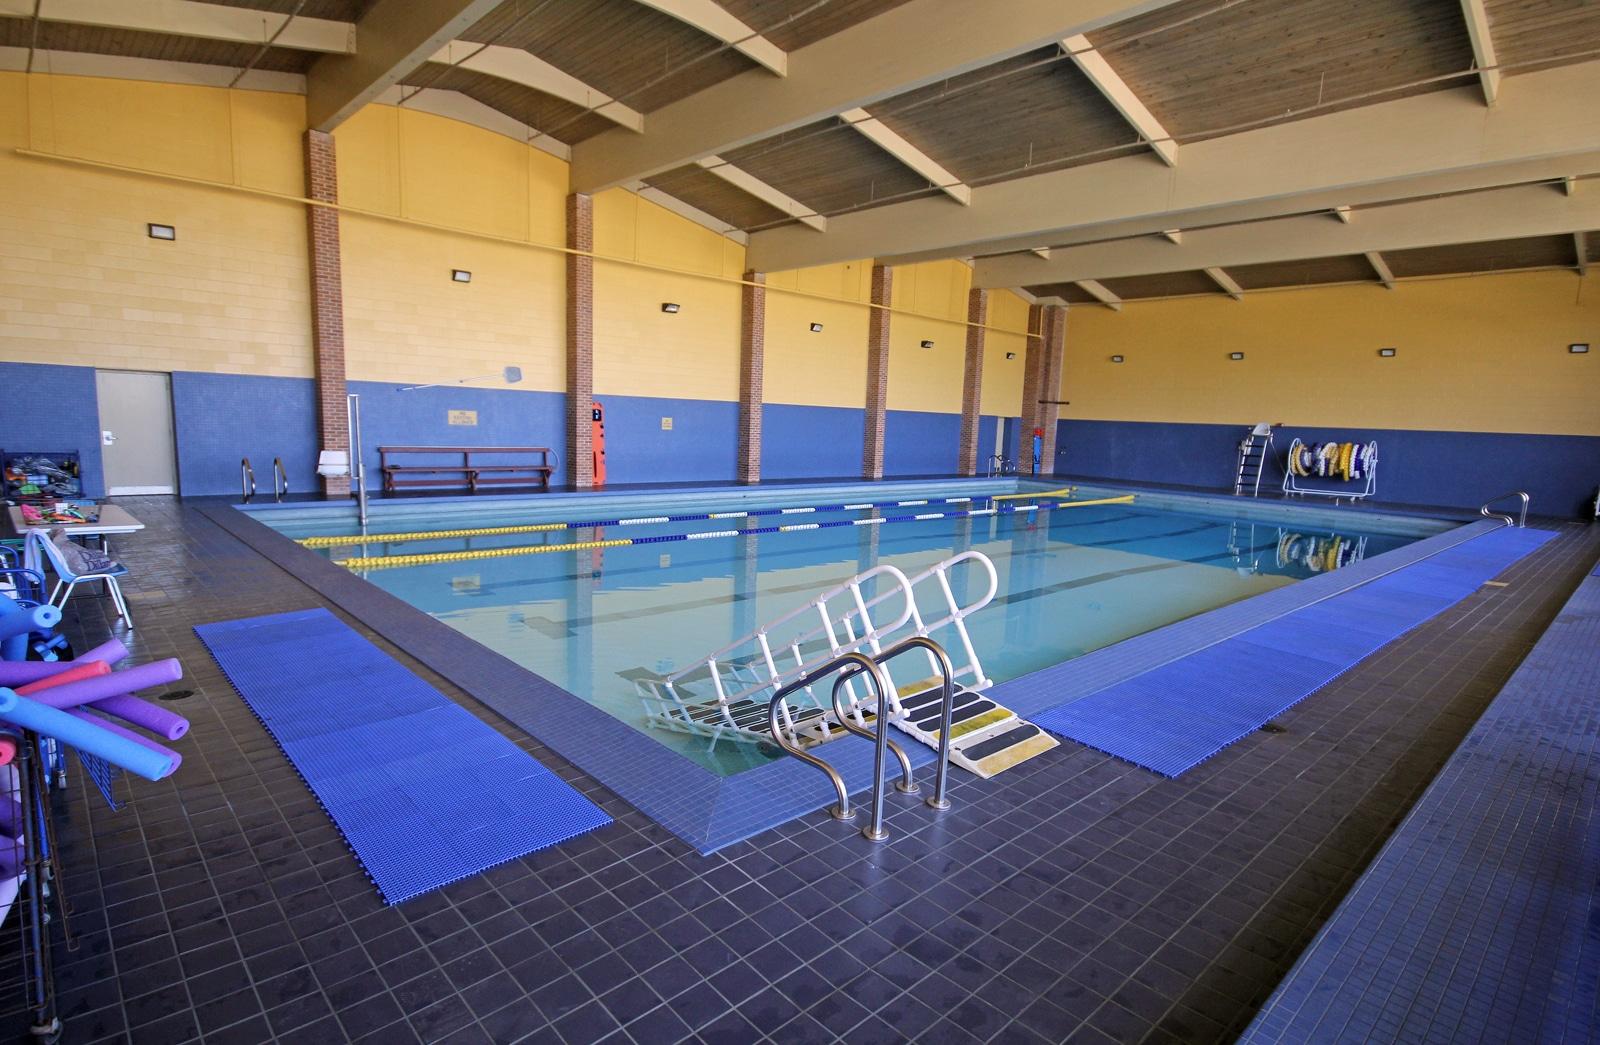 Get fit this summer at SAU's Aquatic Center